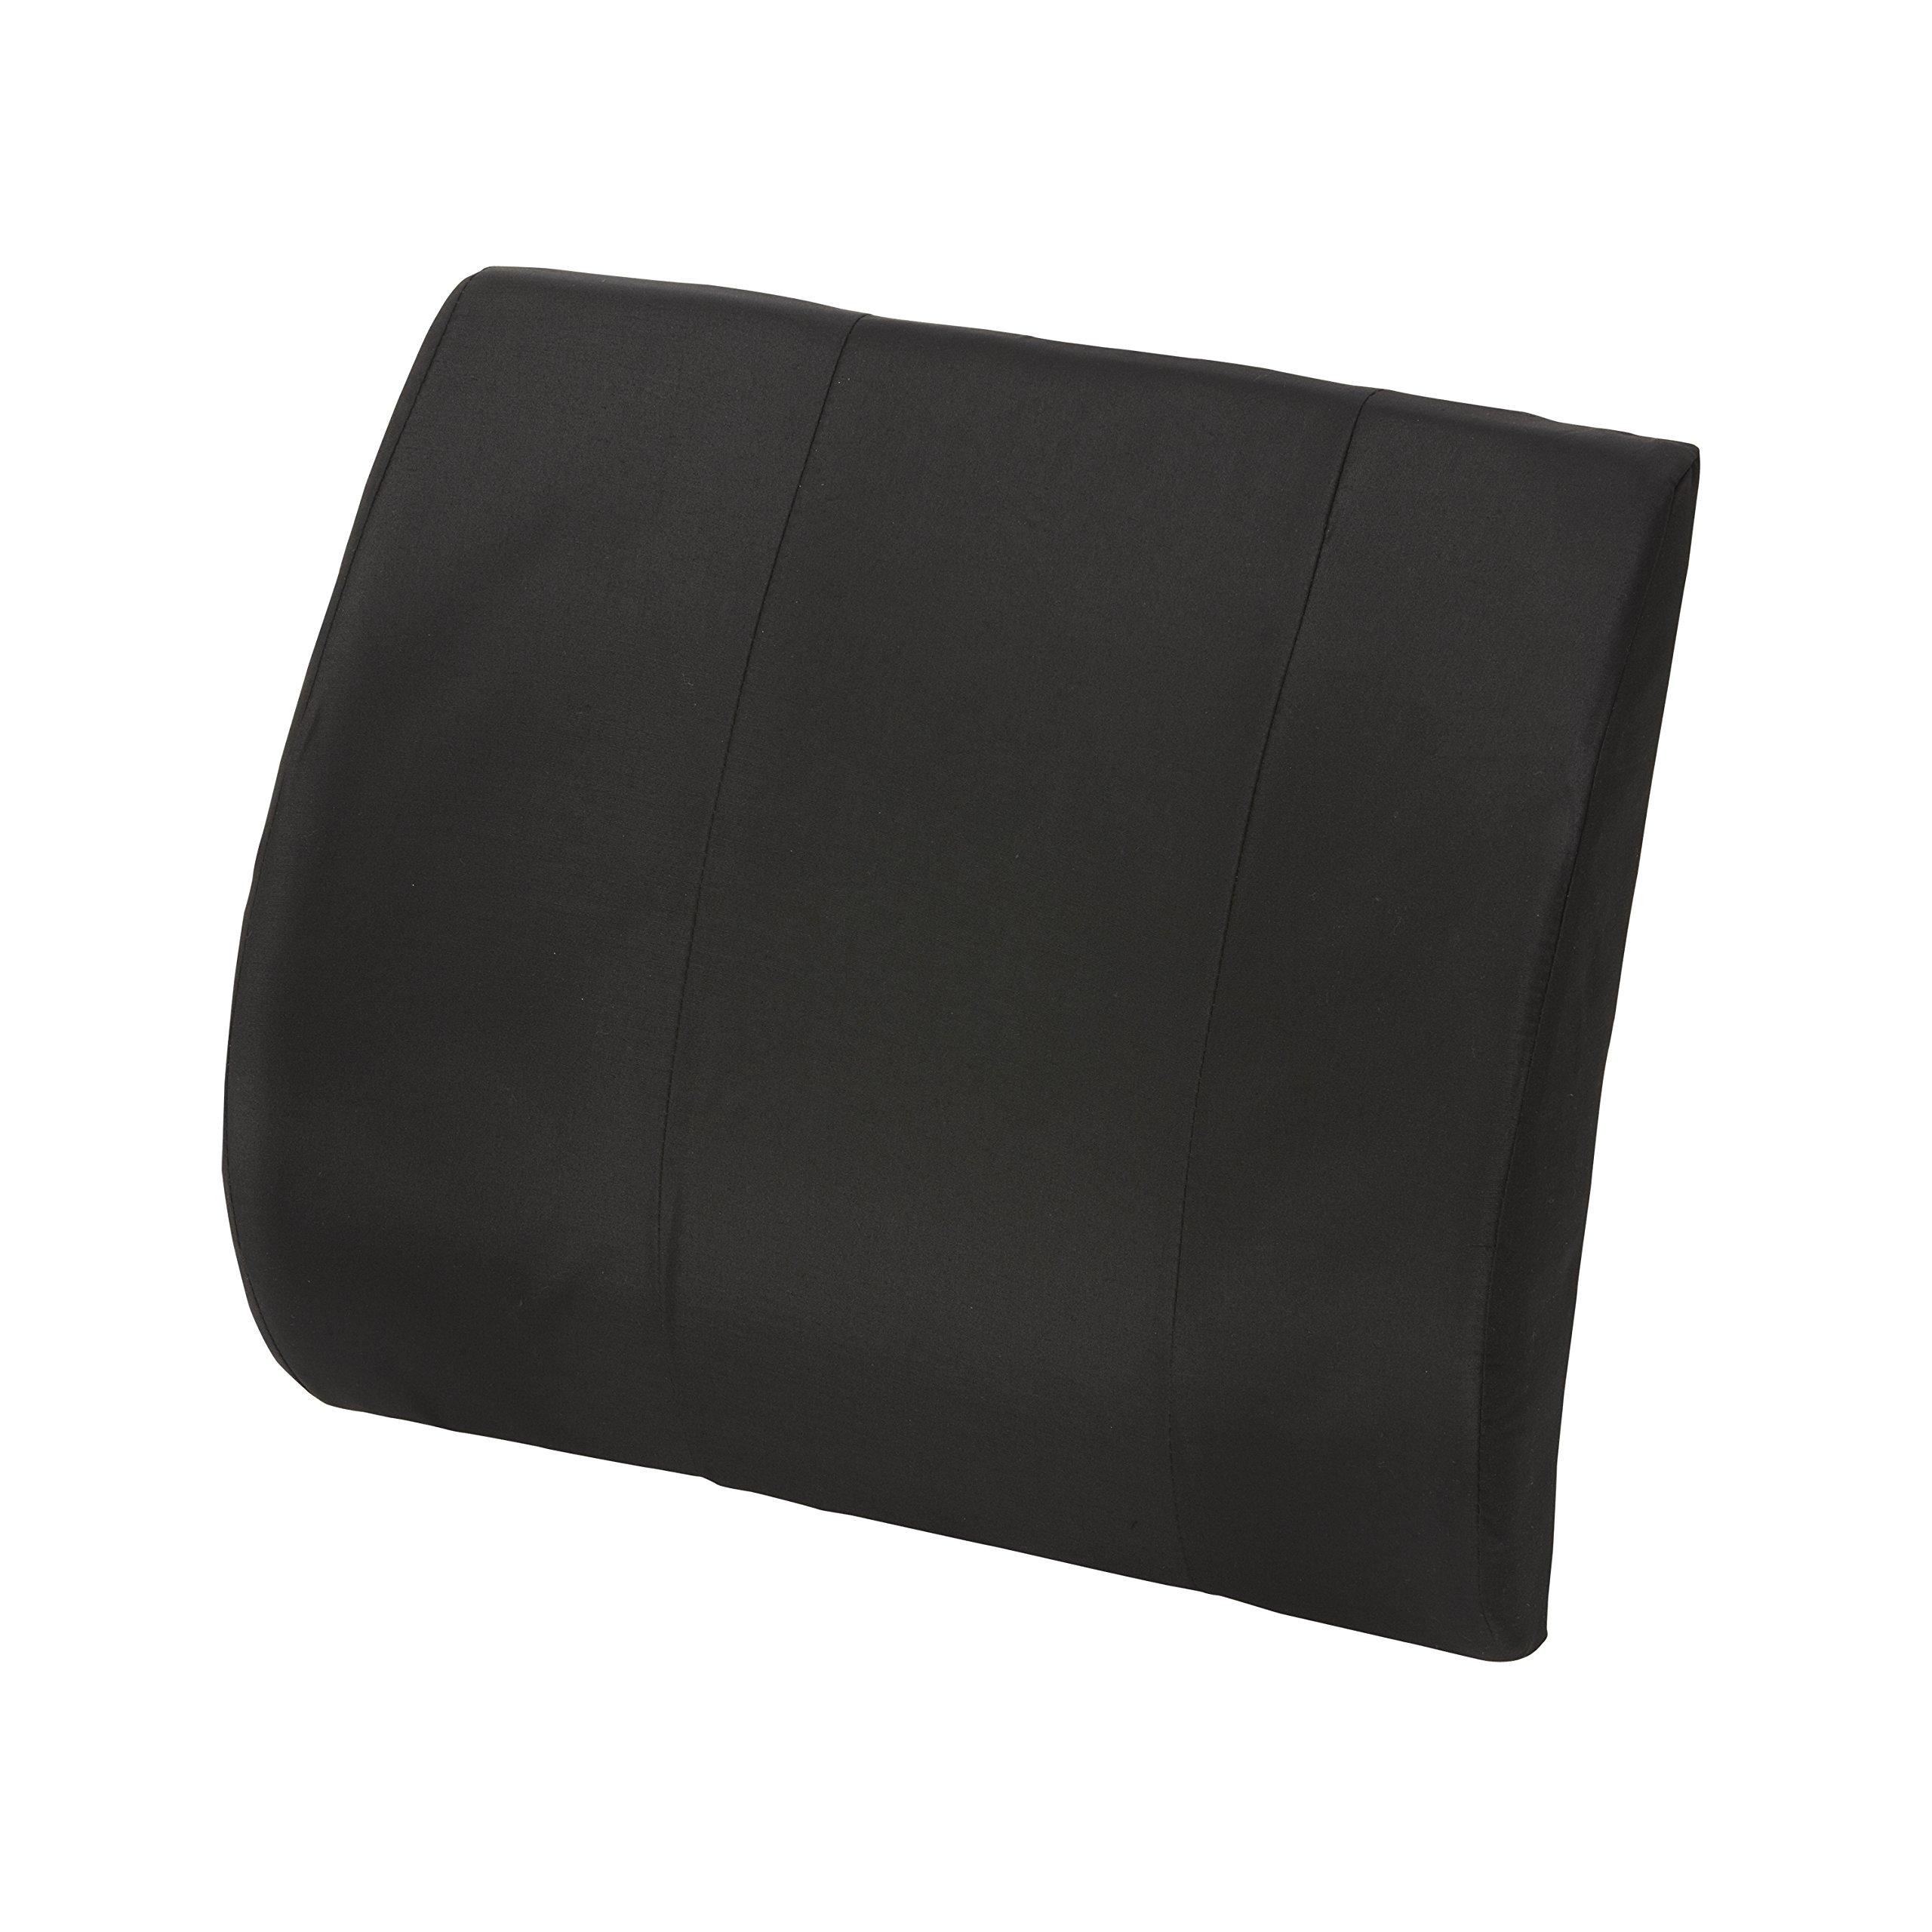 Lumbar Cushion - Office Chair Back Pillow - Low Back Support Cushion, Lumbar Back Support Foam Seat Cushion for Car, Black